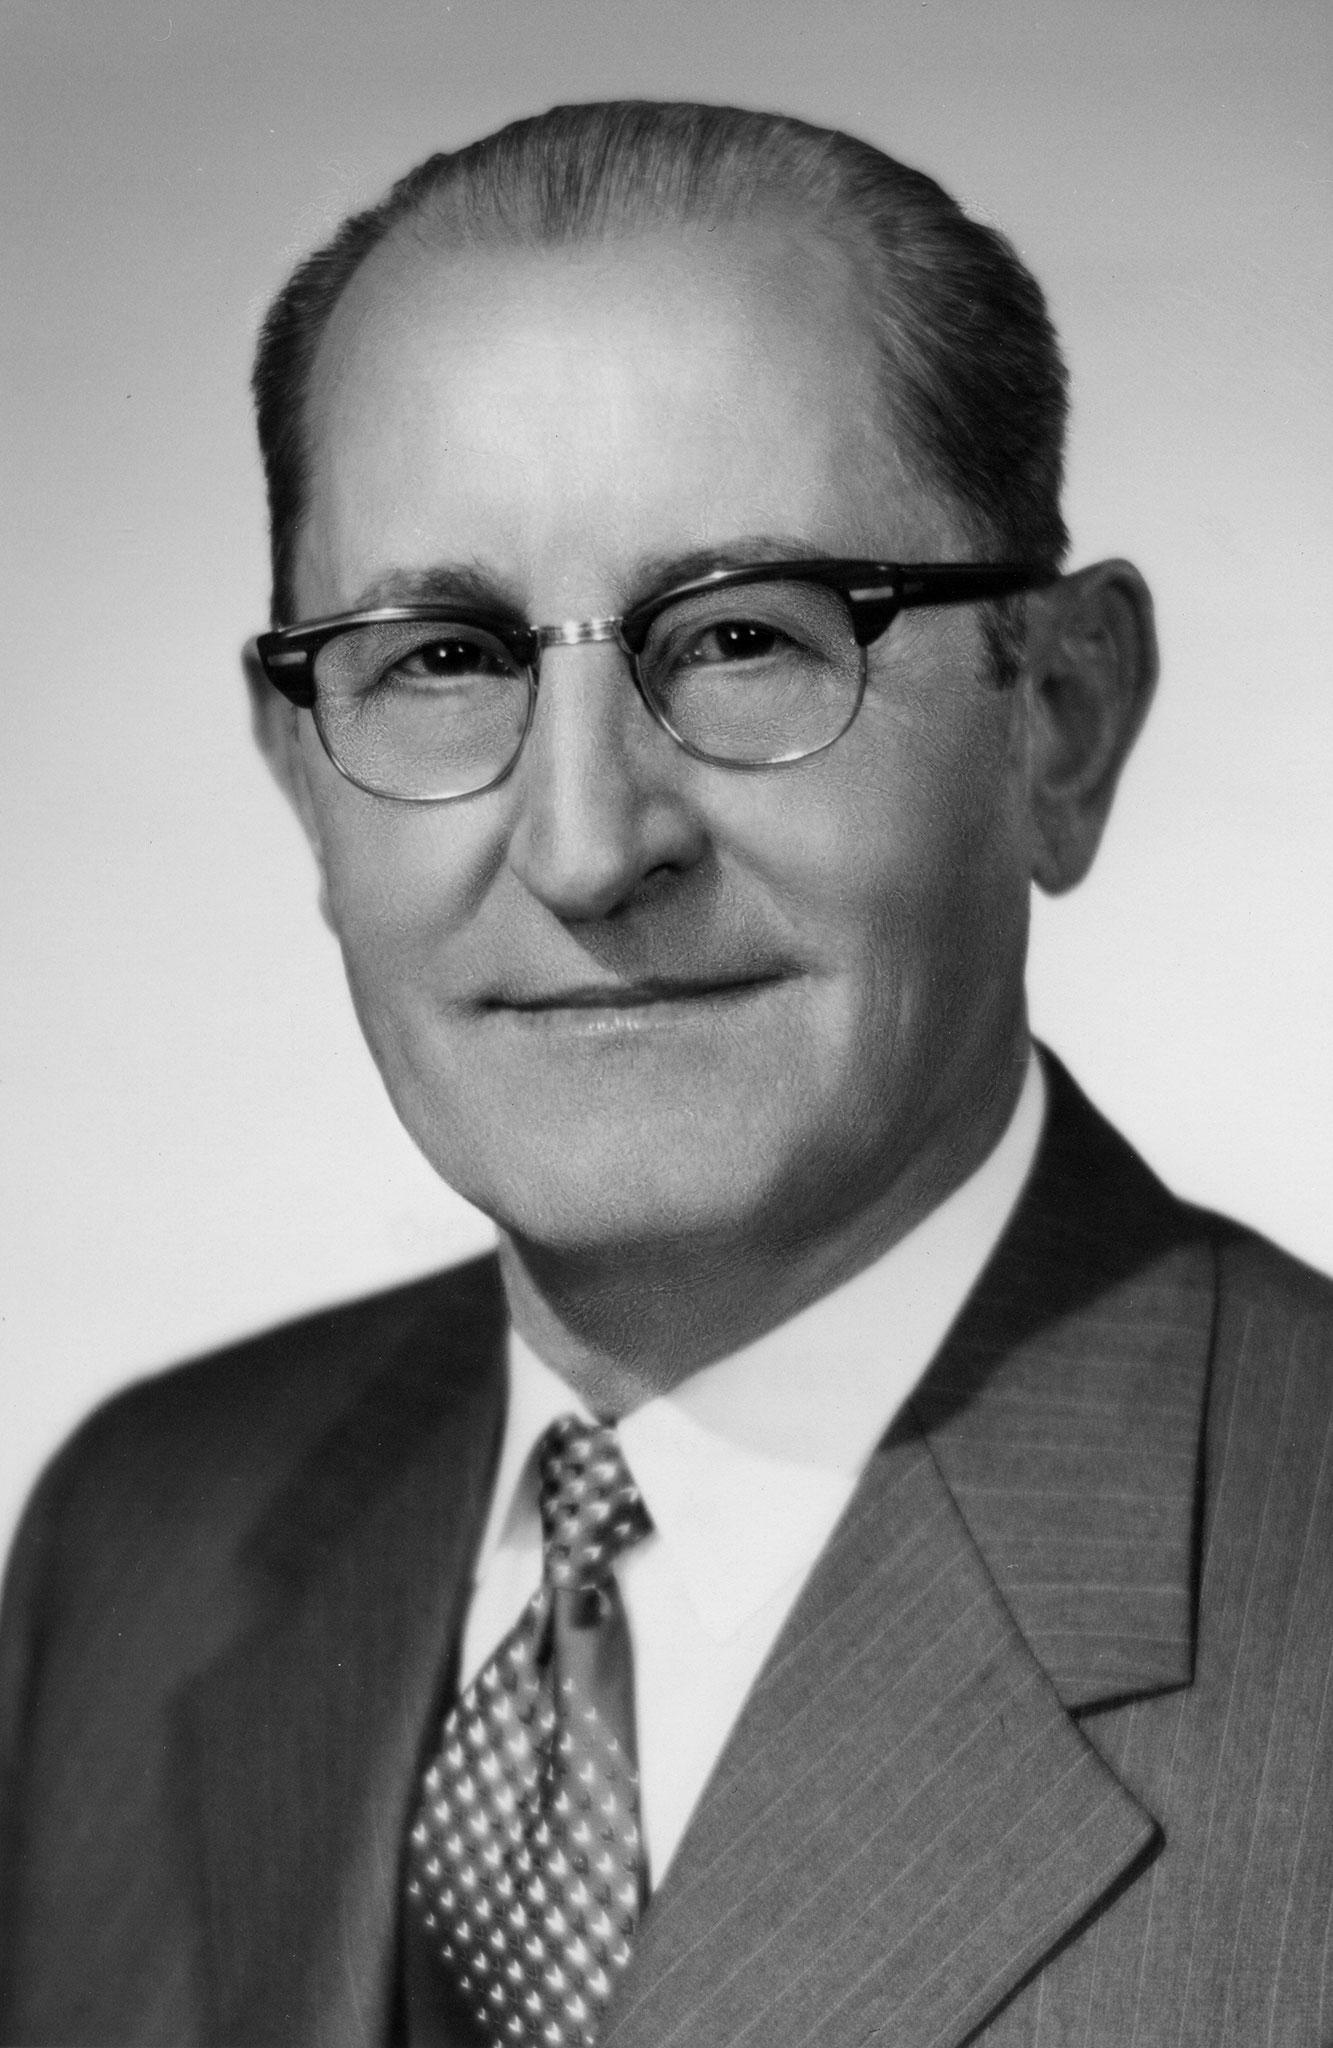 Lewis H. Munn, Oklahoma Farm Bureau president